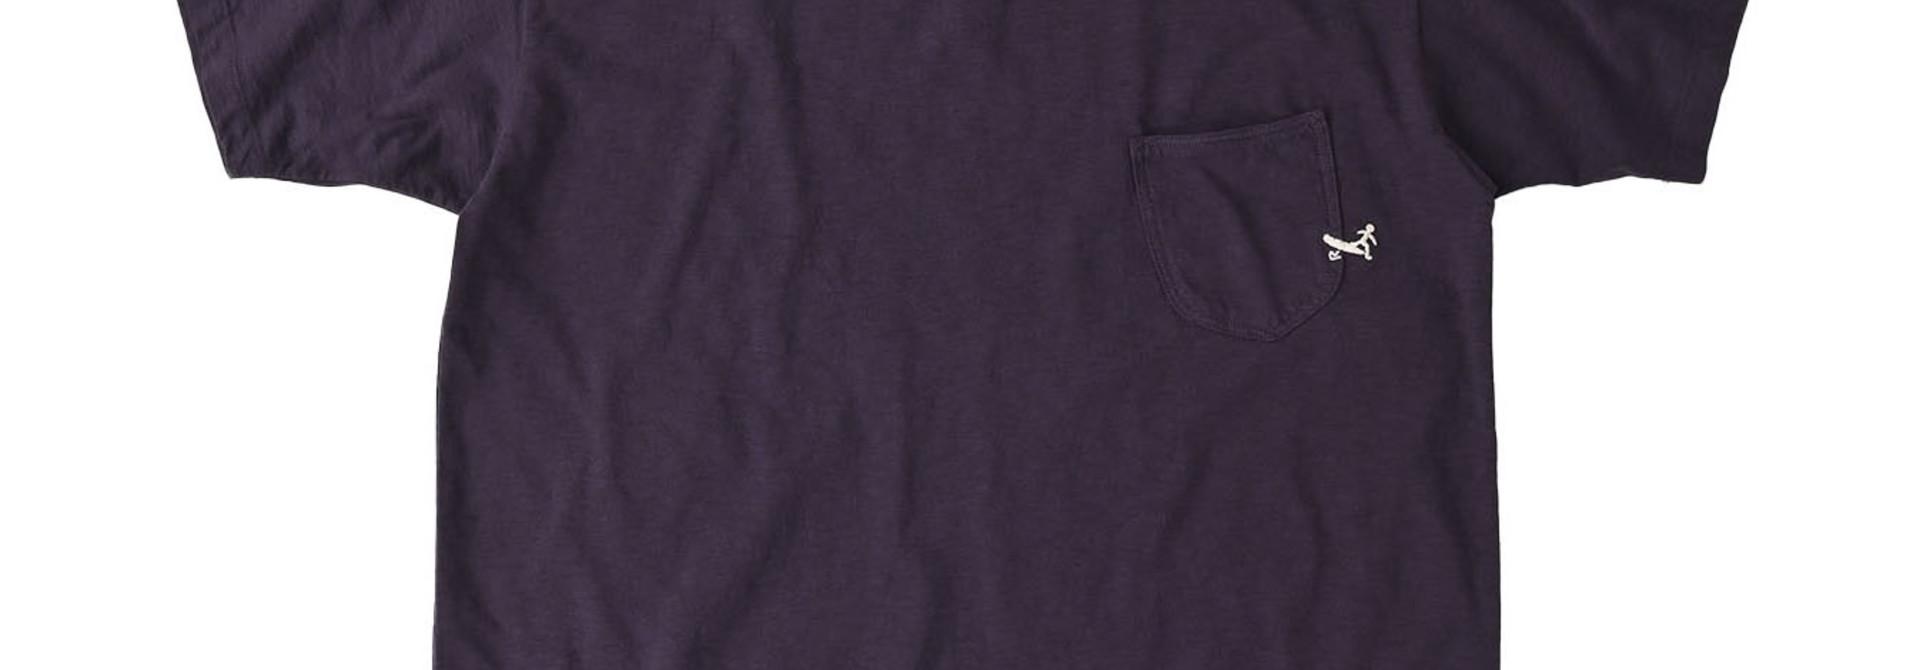 Hayama-kun Embroidered 908 Ocean T-shirt (0621)